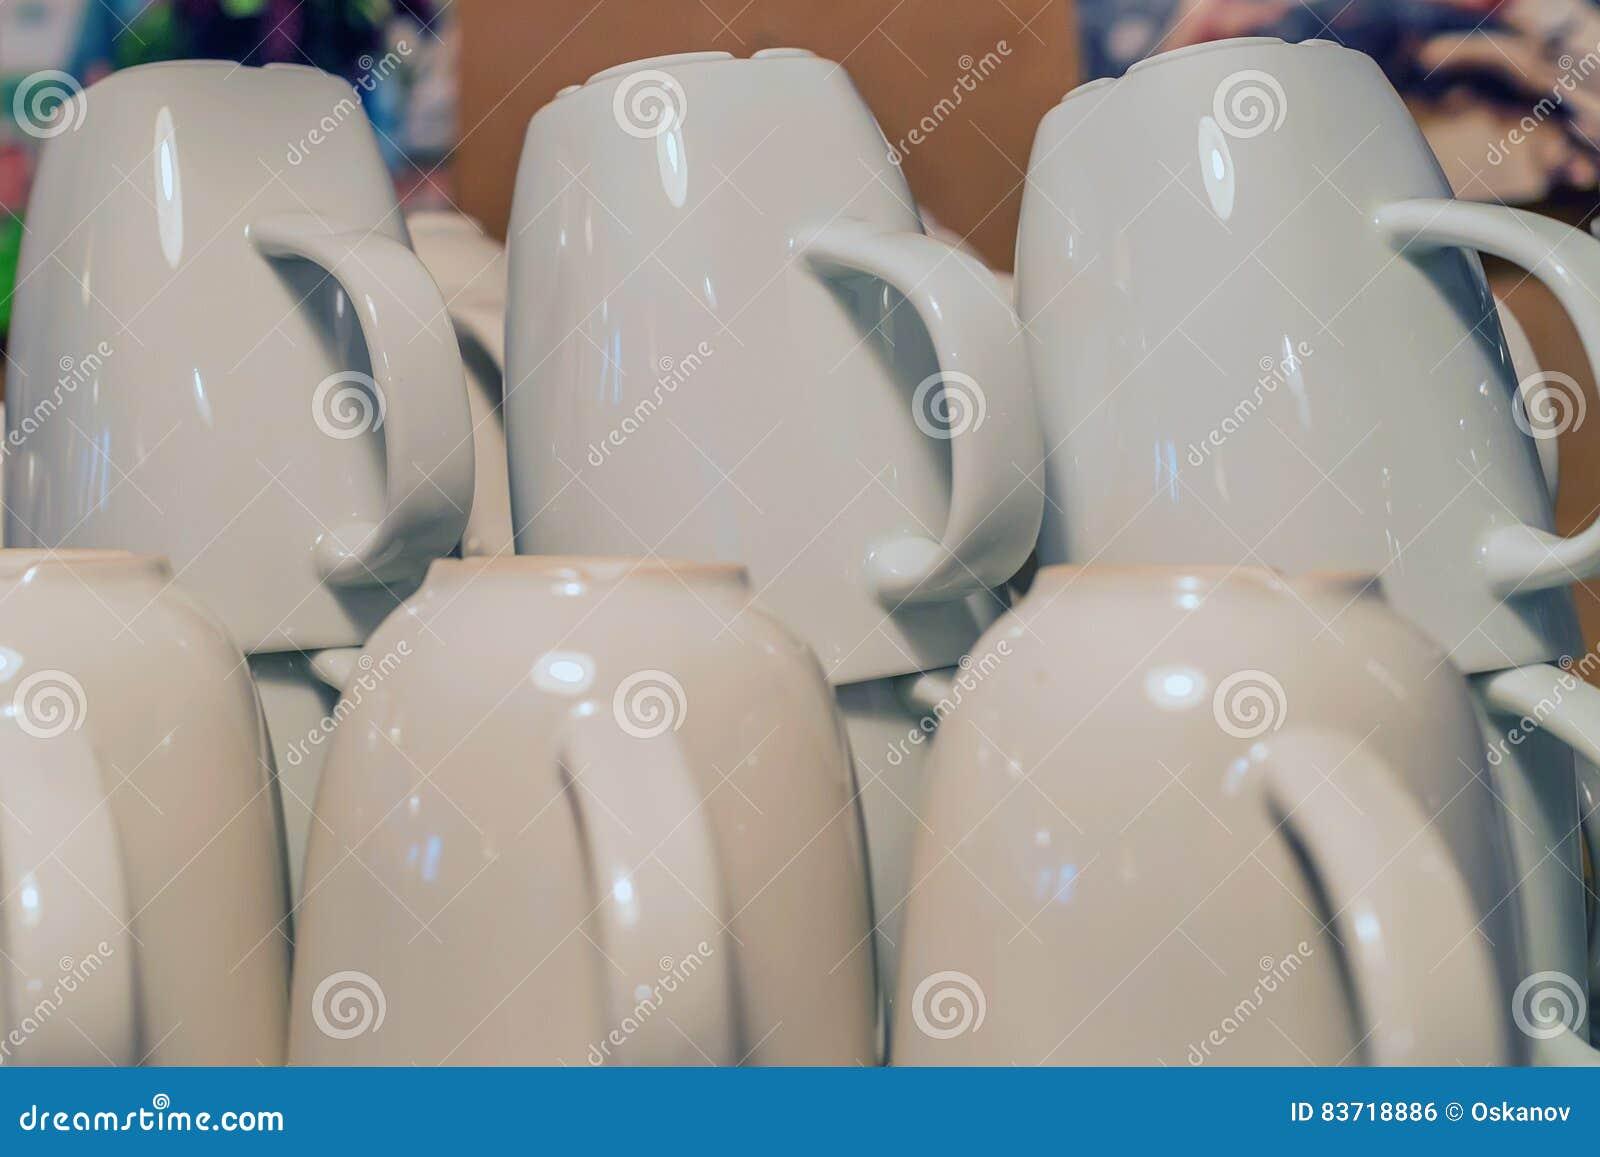 Photo Of Many Mugs Stock Photo